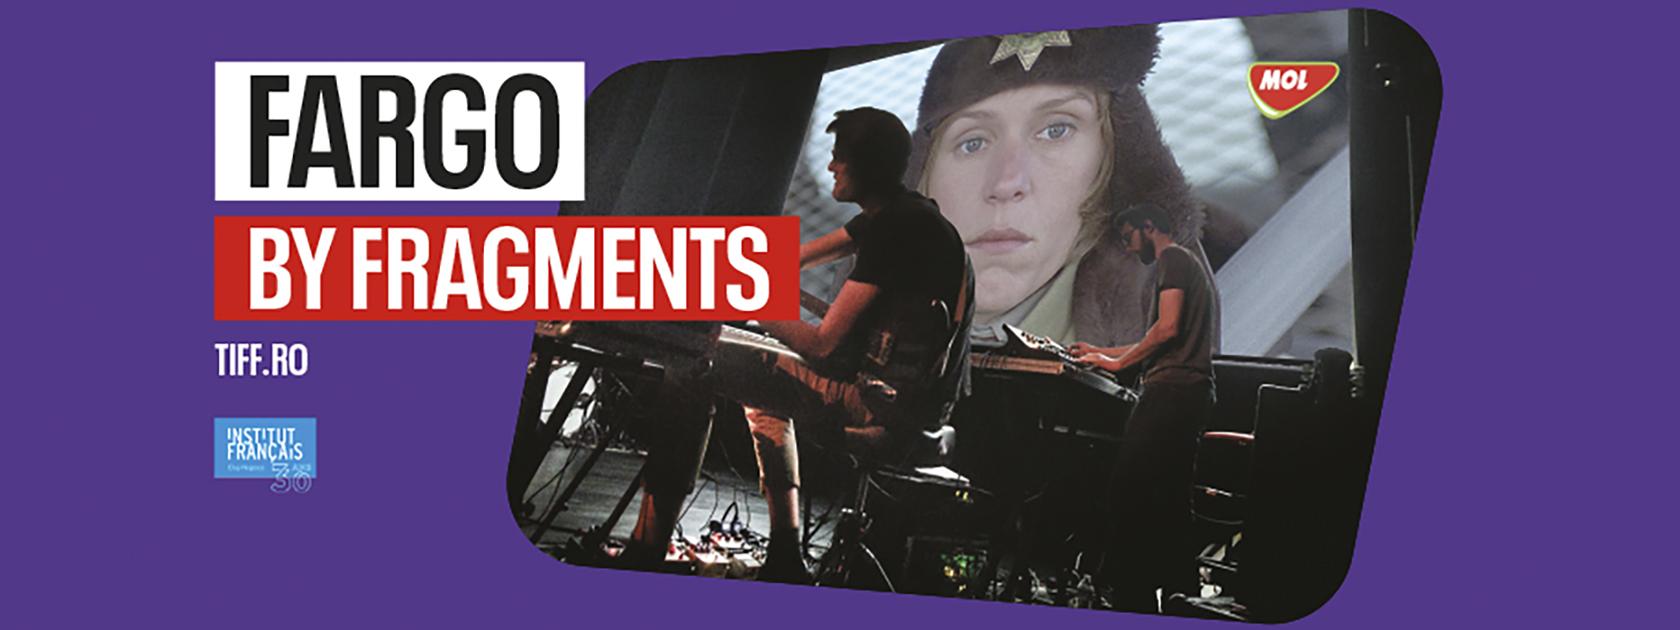 Fargo by Fragments